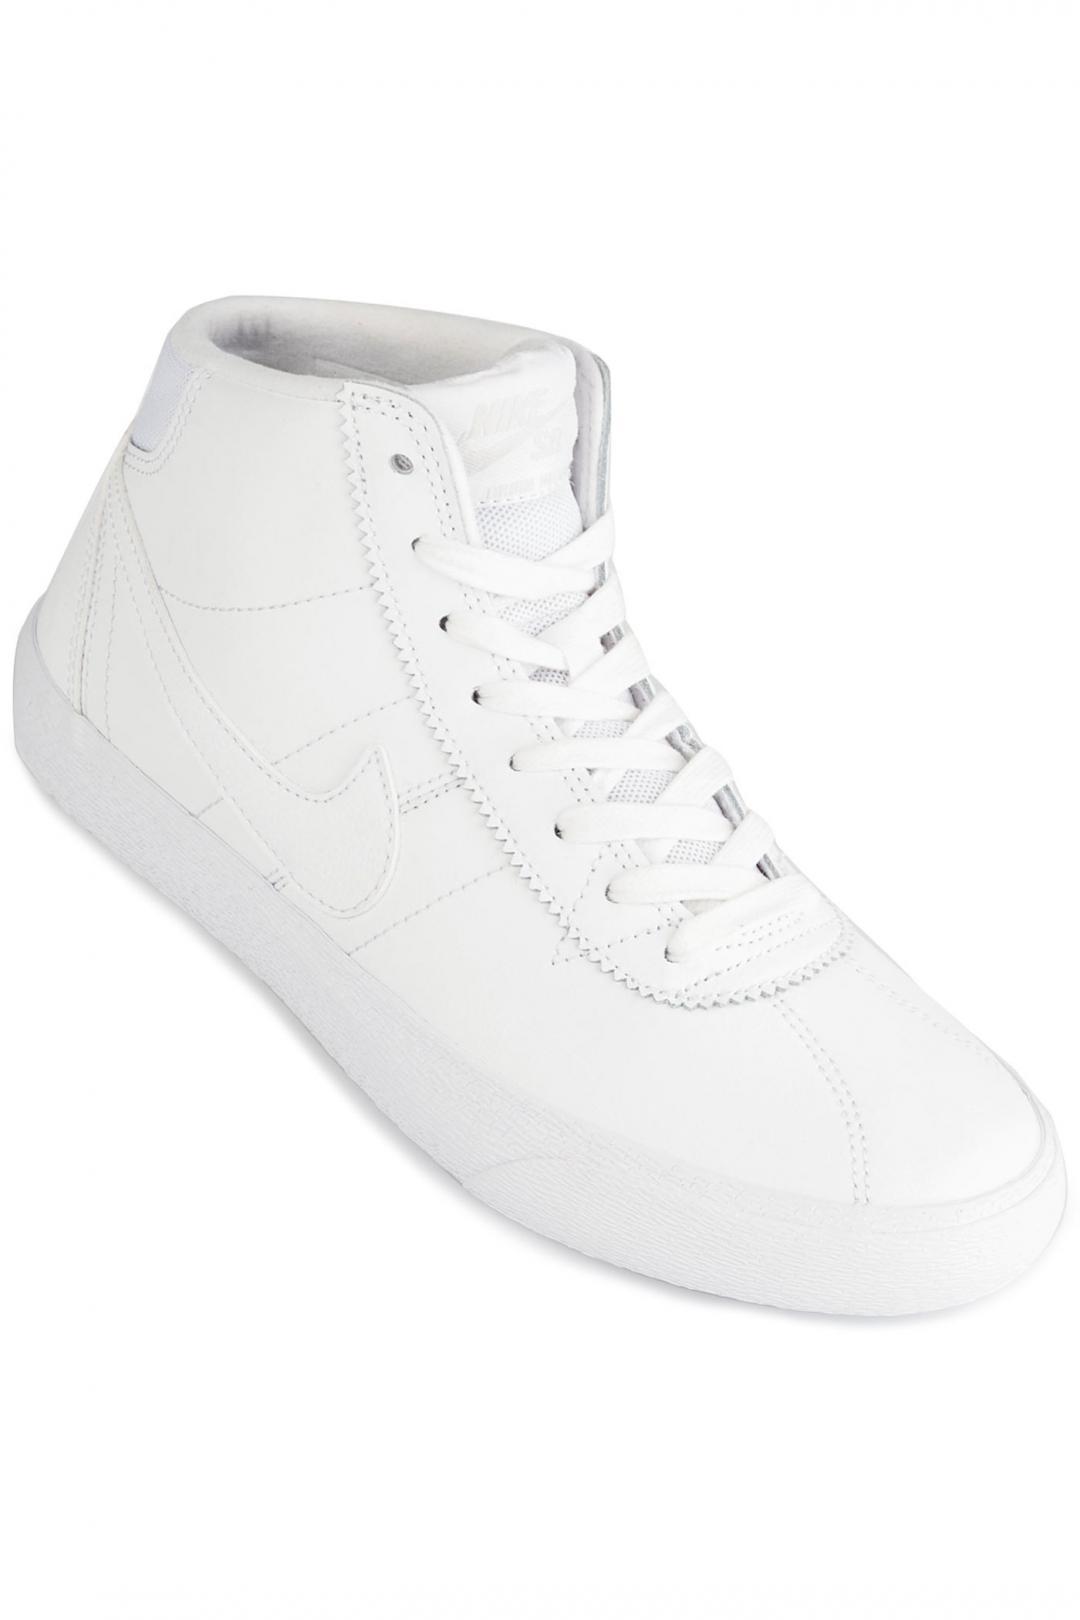 Donna Nike SB Bruin Hi white vast grey   Scarpe da skate